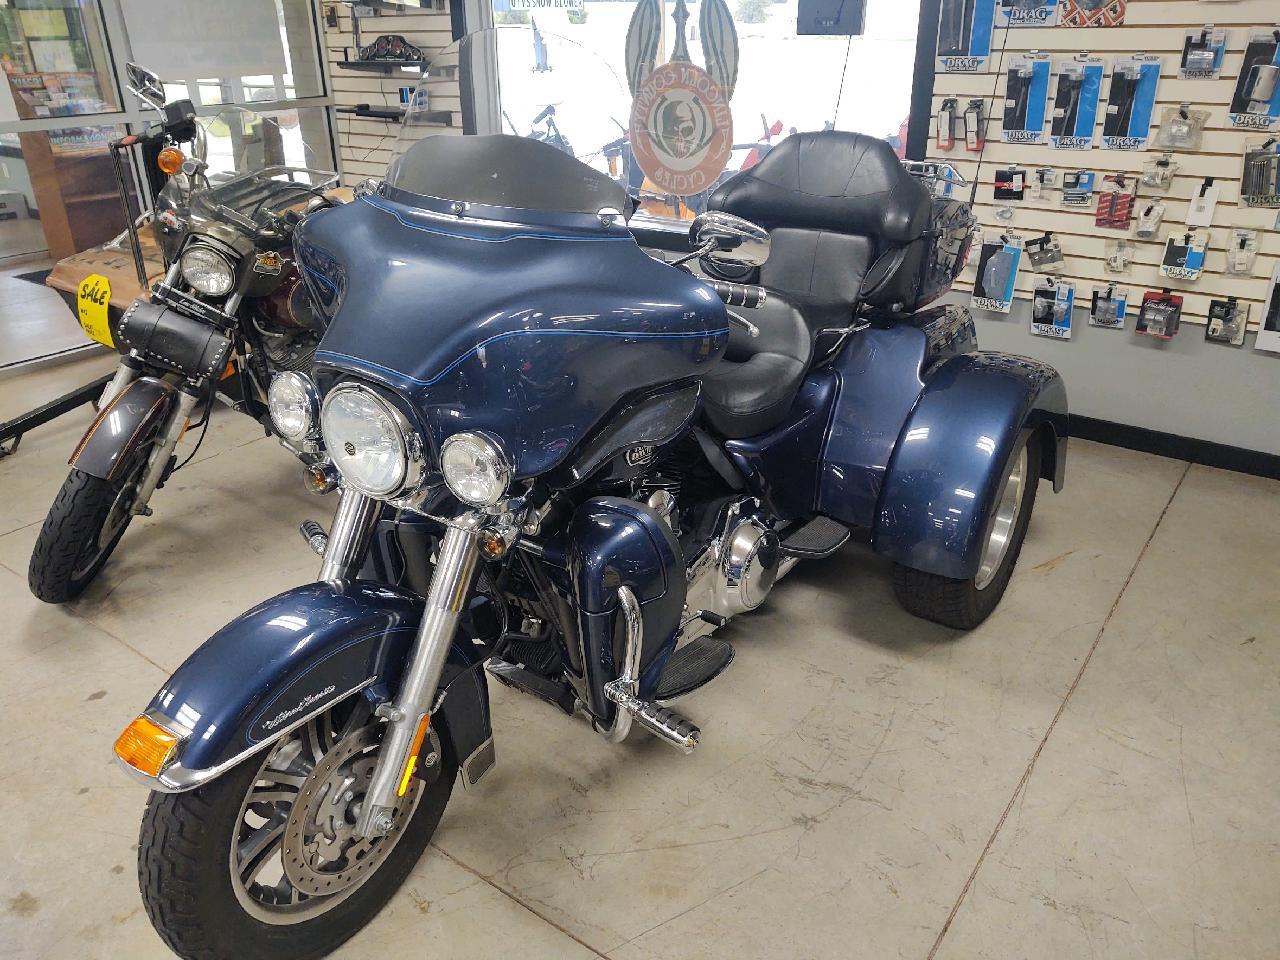 SOLD – 2009 Harley-Davidson Tri-Glide